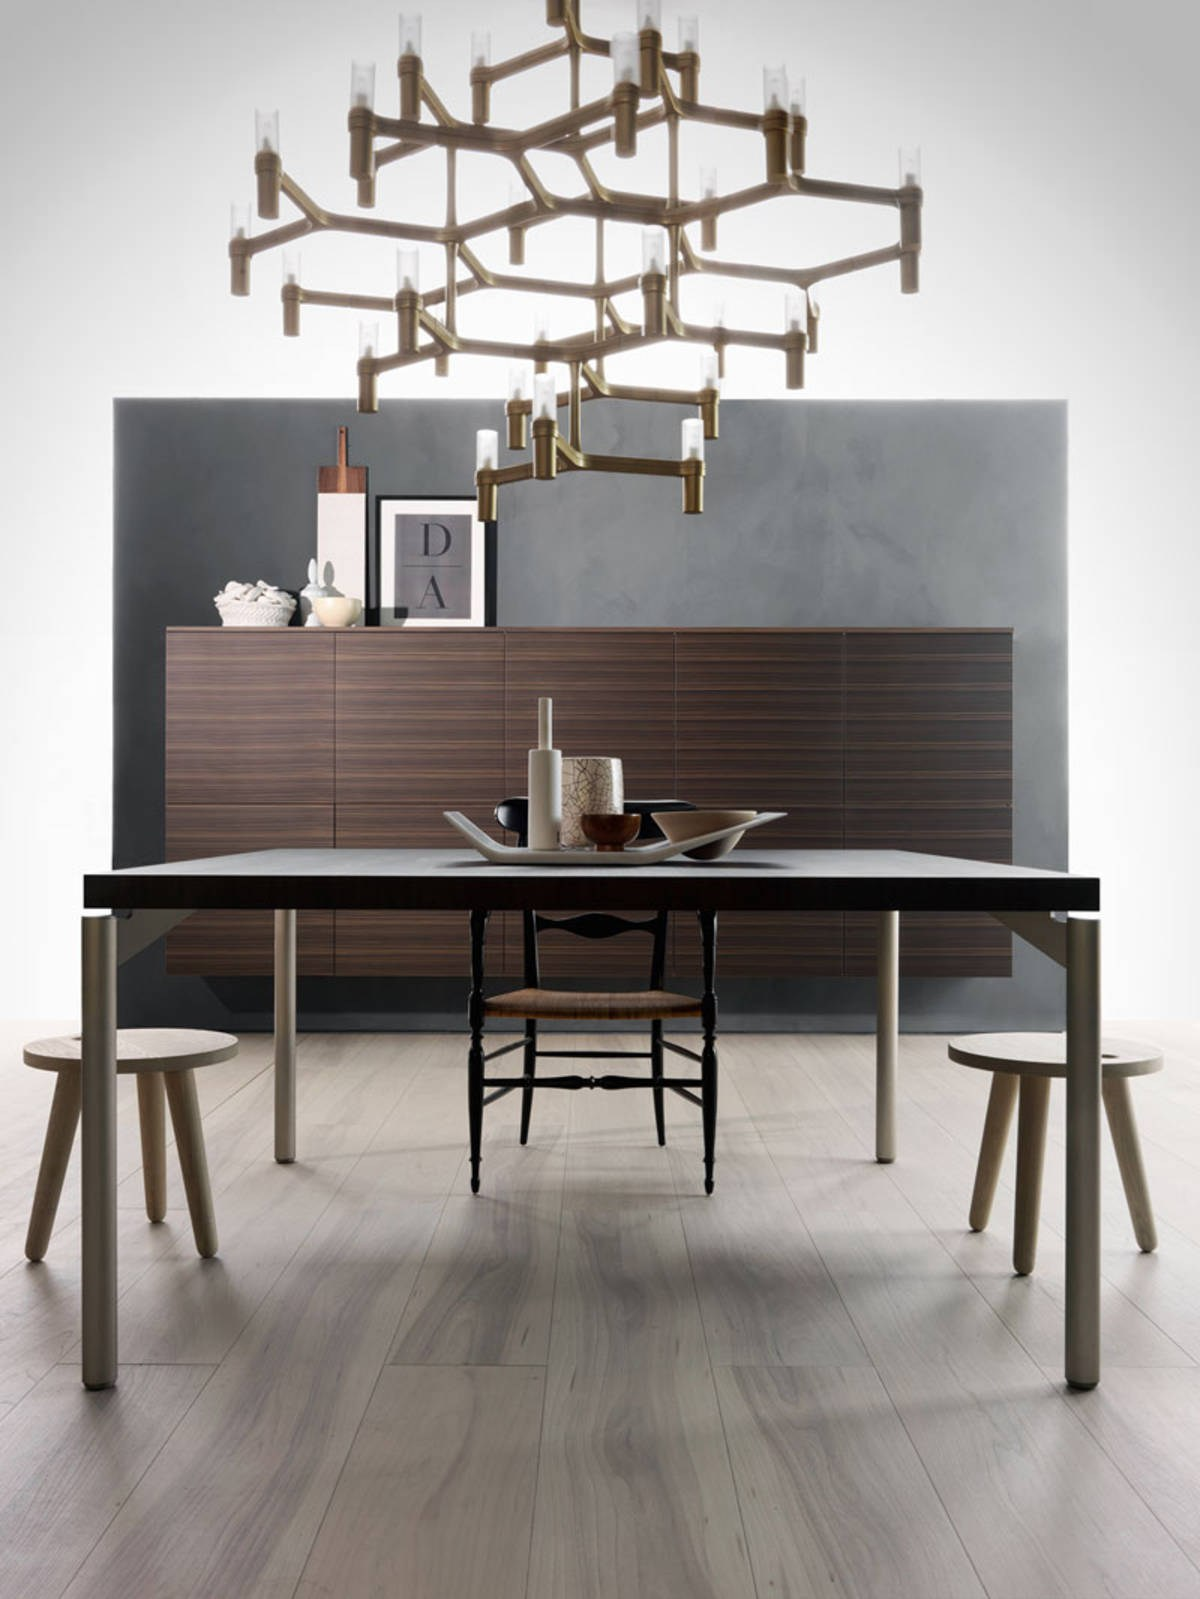 Cucina componibile modulare INDada by DADA design Nicola Gallizia